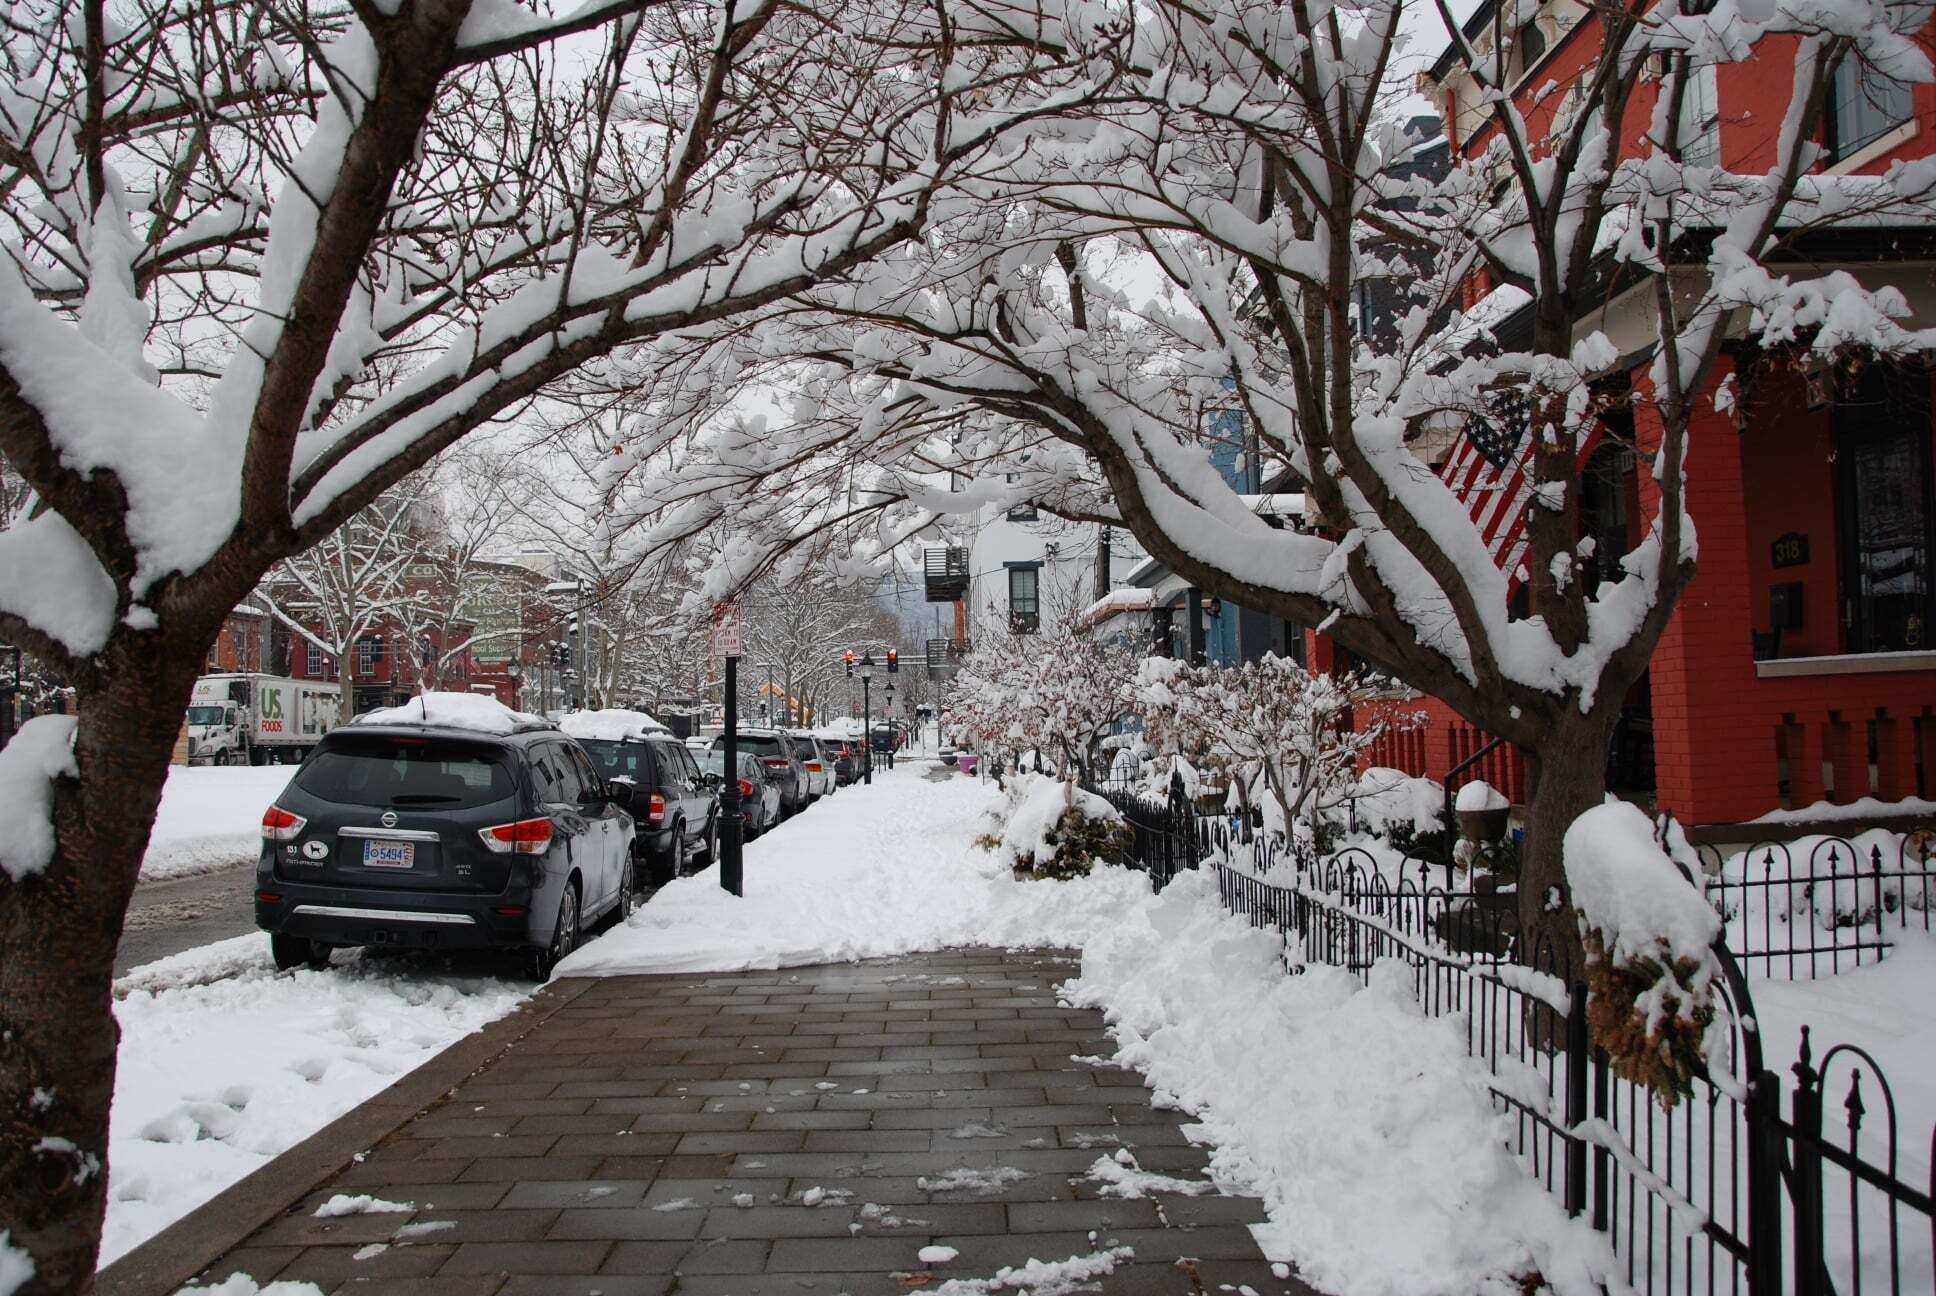 snow-mainstrasse-sixth-street-angie-coyle.jpg